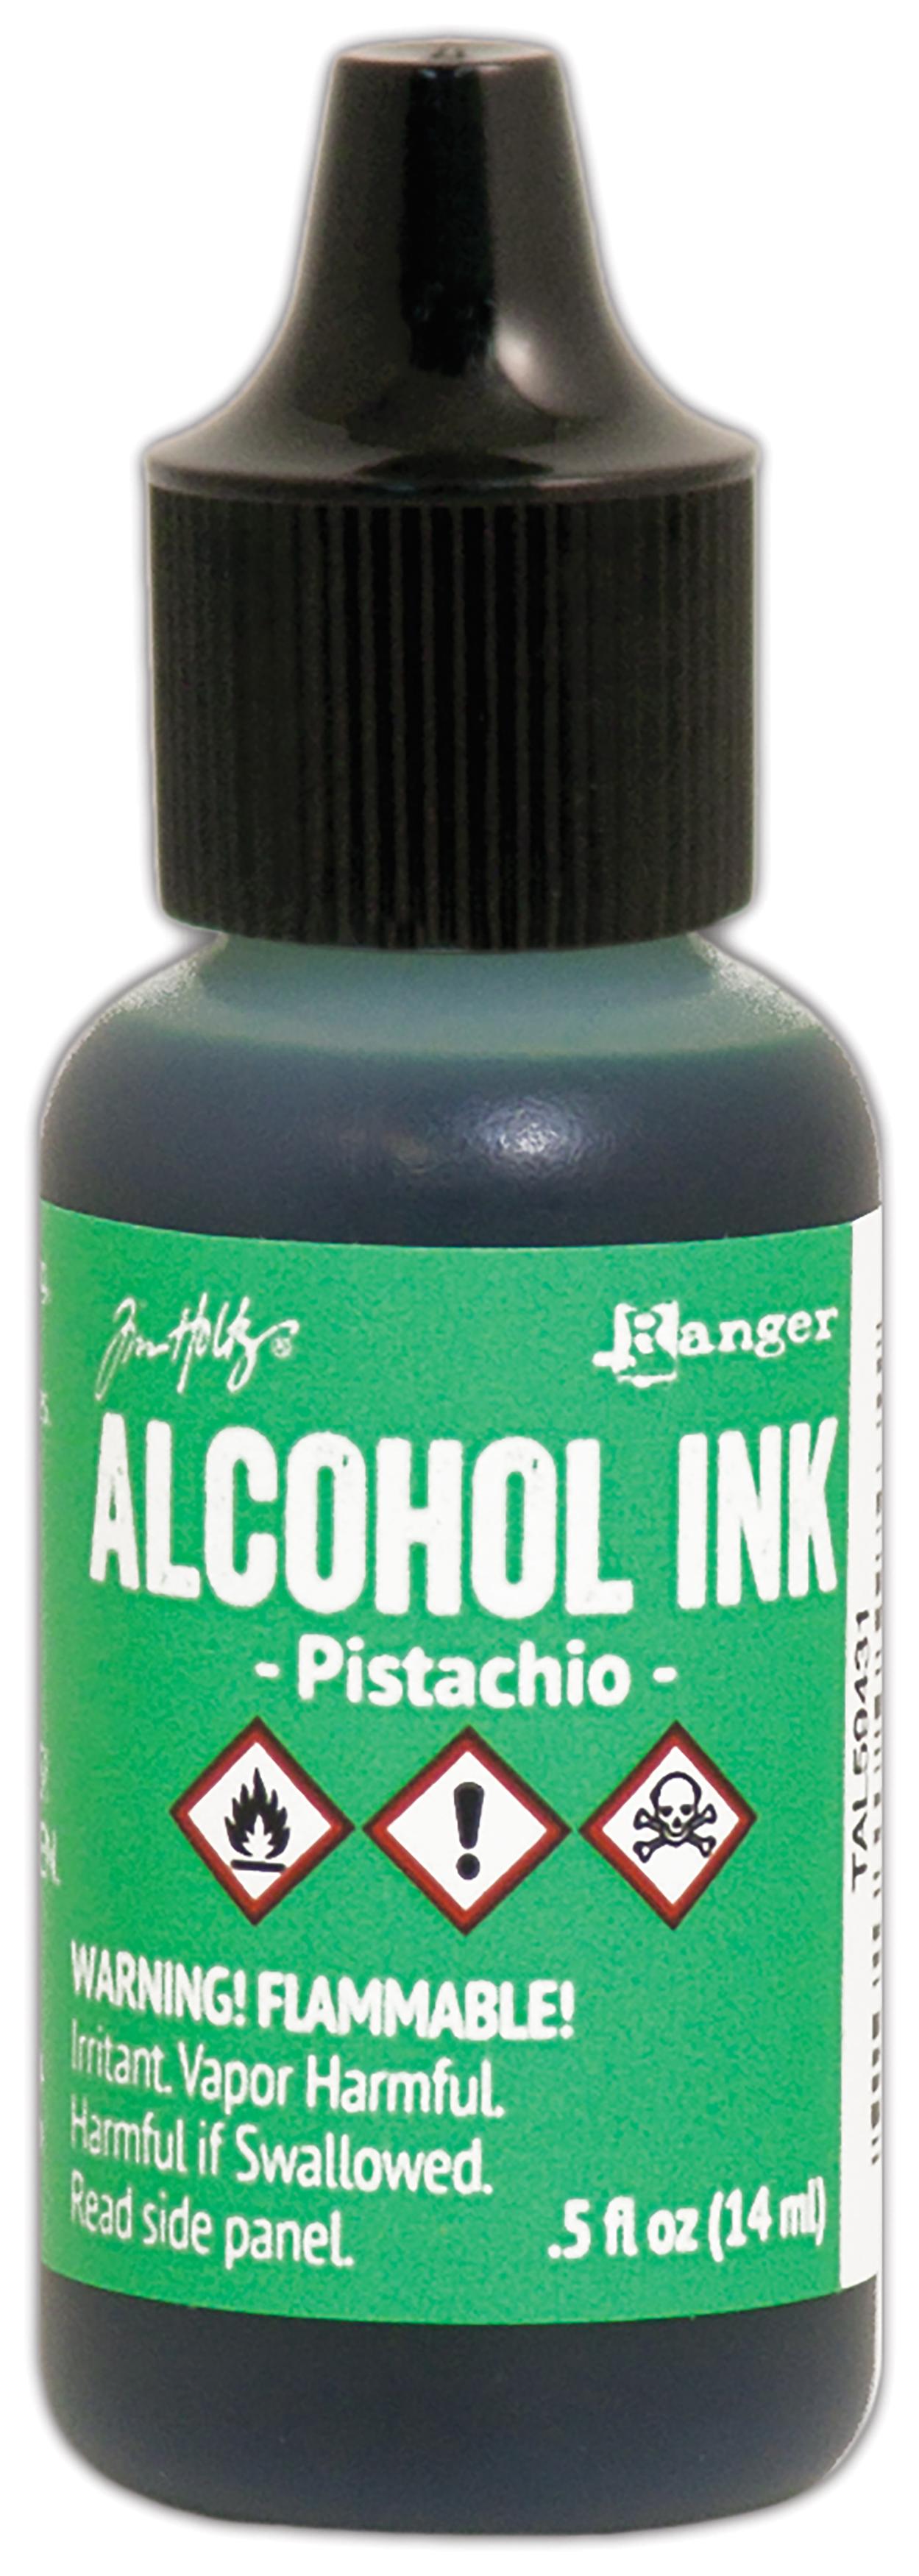 Alcohol Ink - Pistachio